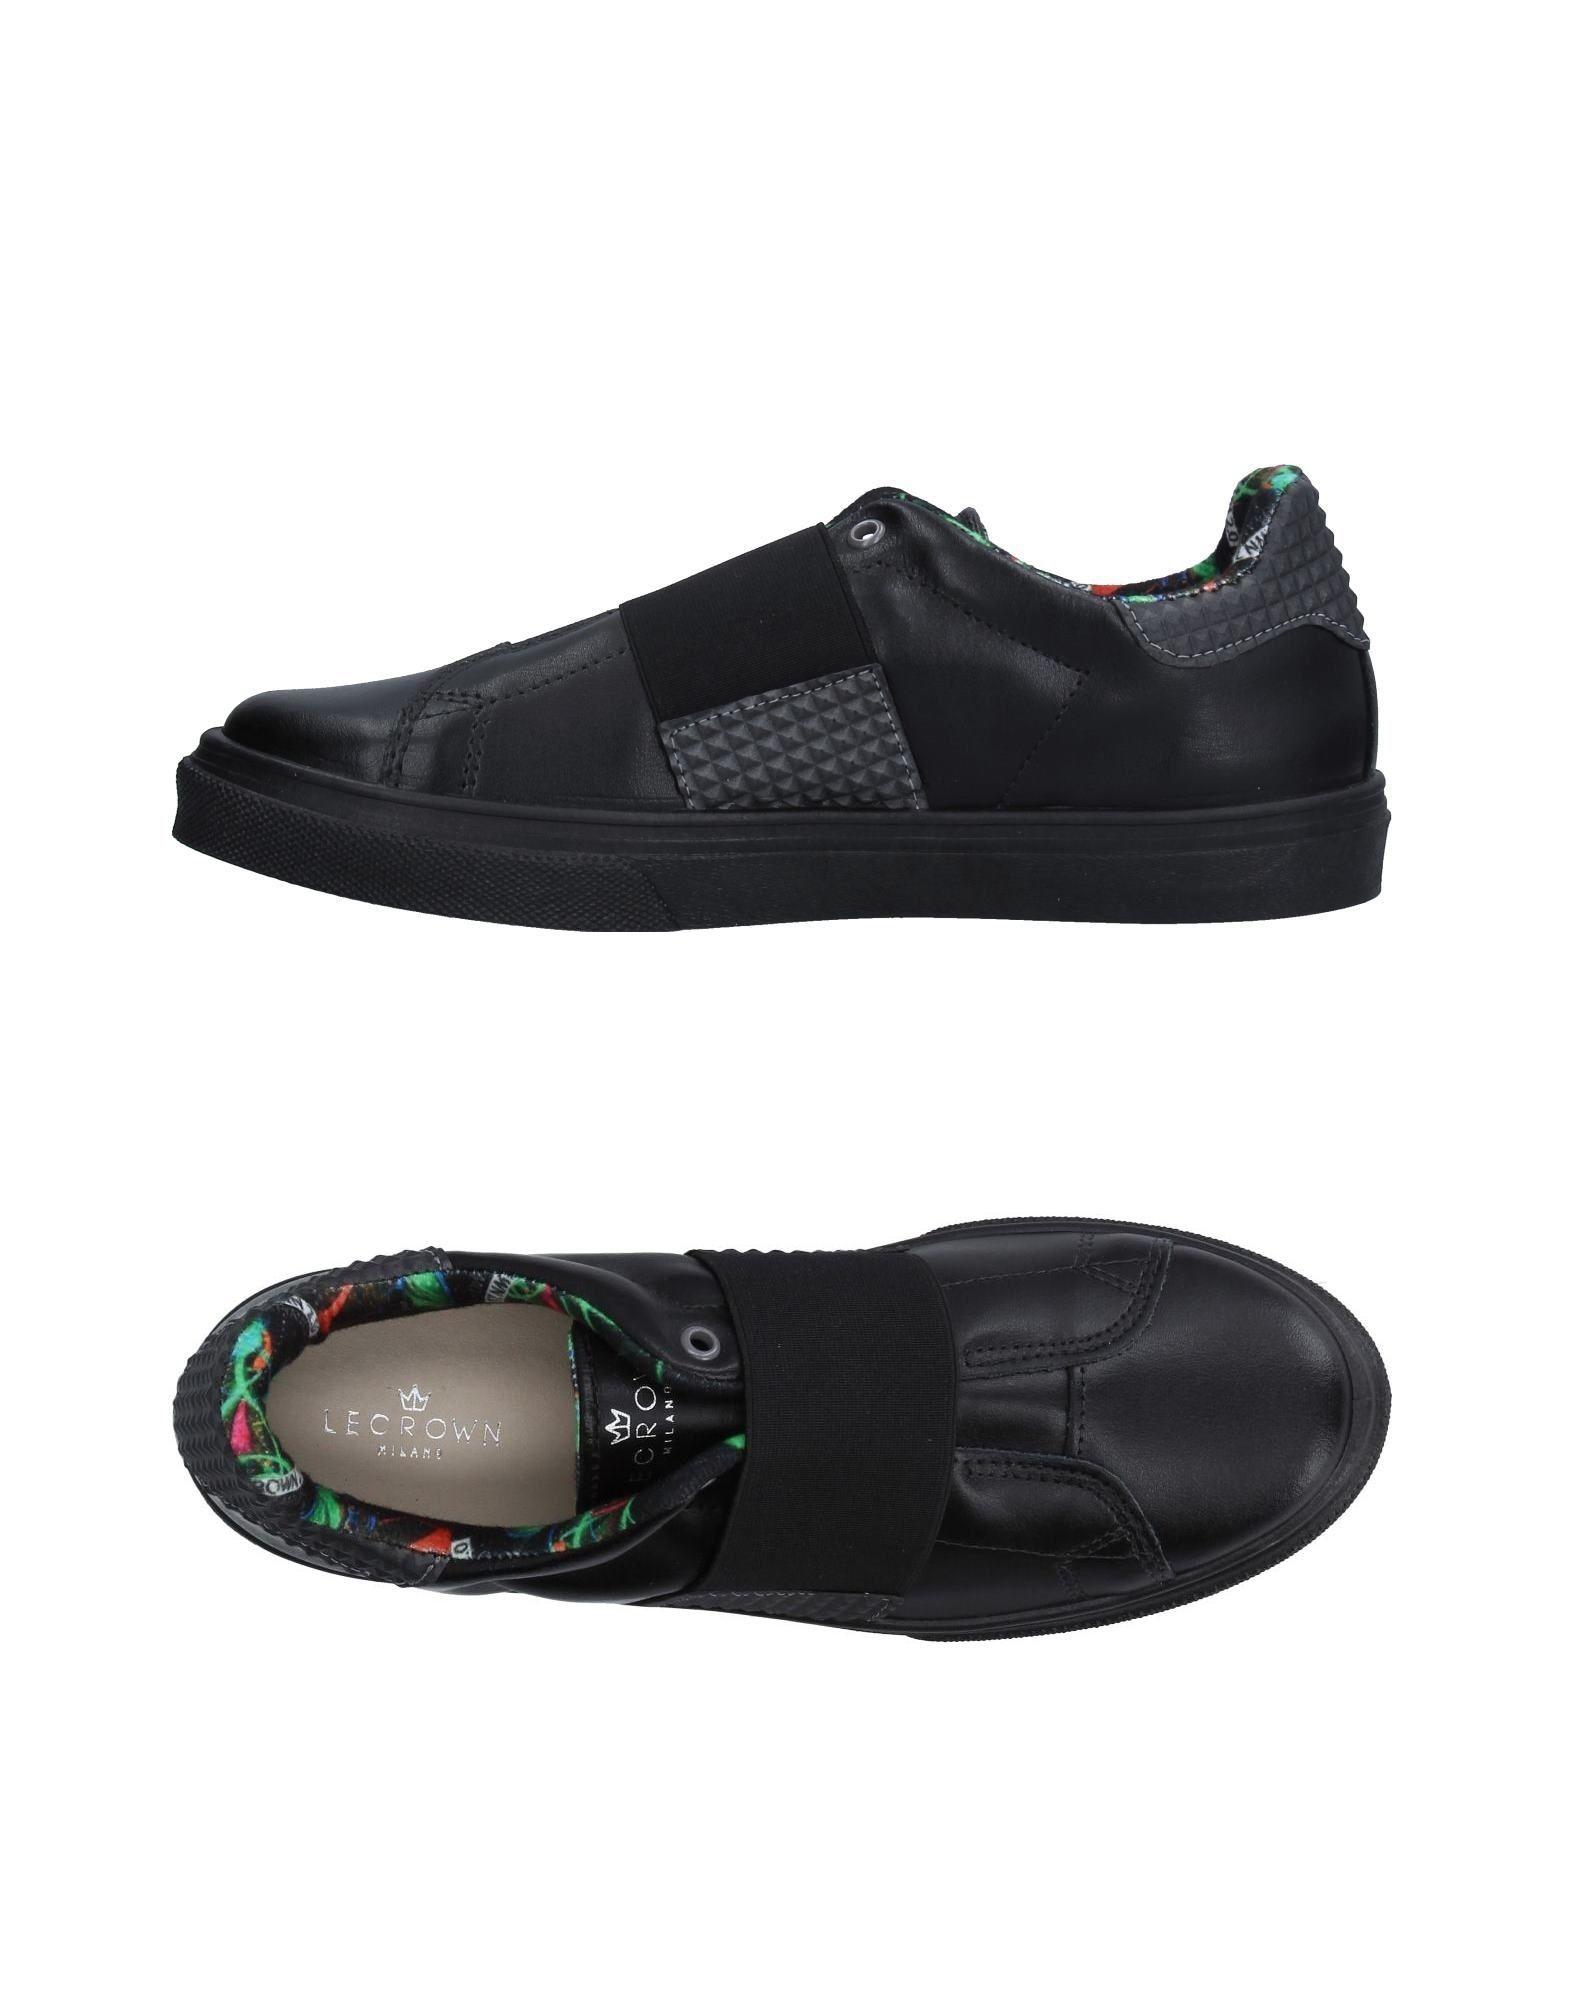 LE CROWN Низкие кеды и кроссовки кеды кроссовки низкие женские dc tonik w le black multi